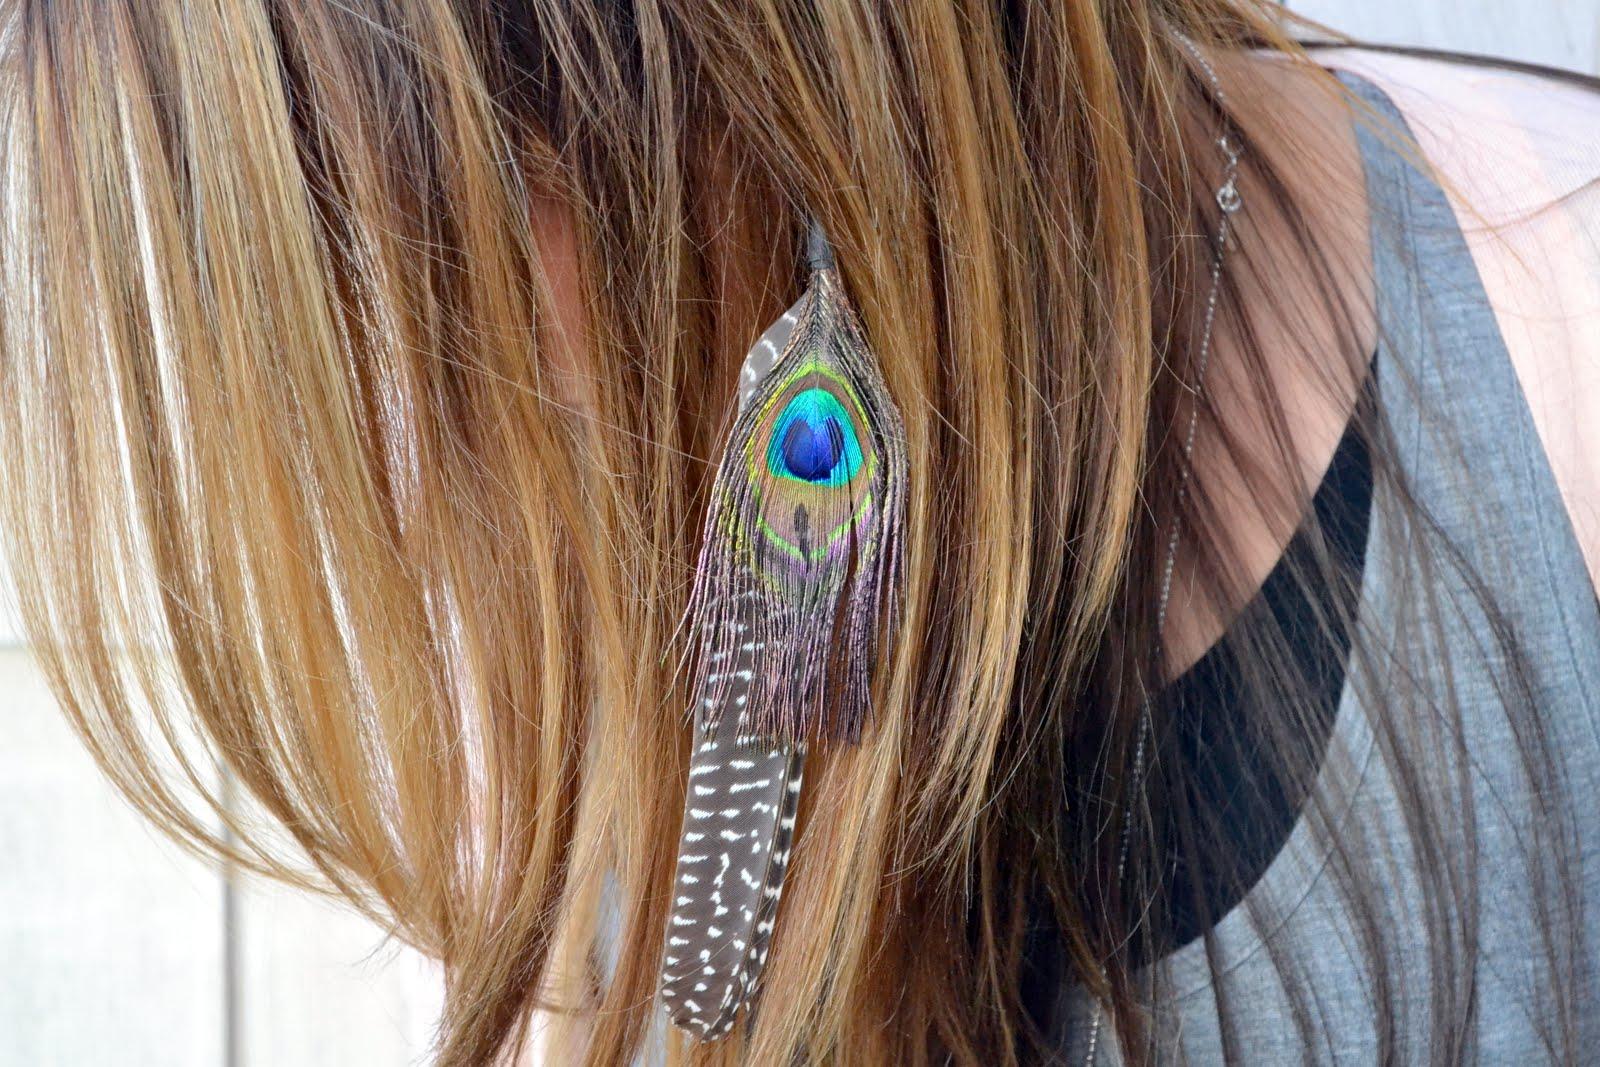 Diy Feather Extension Headband Tutorial Accessories Crafts Diy